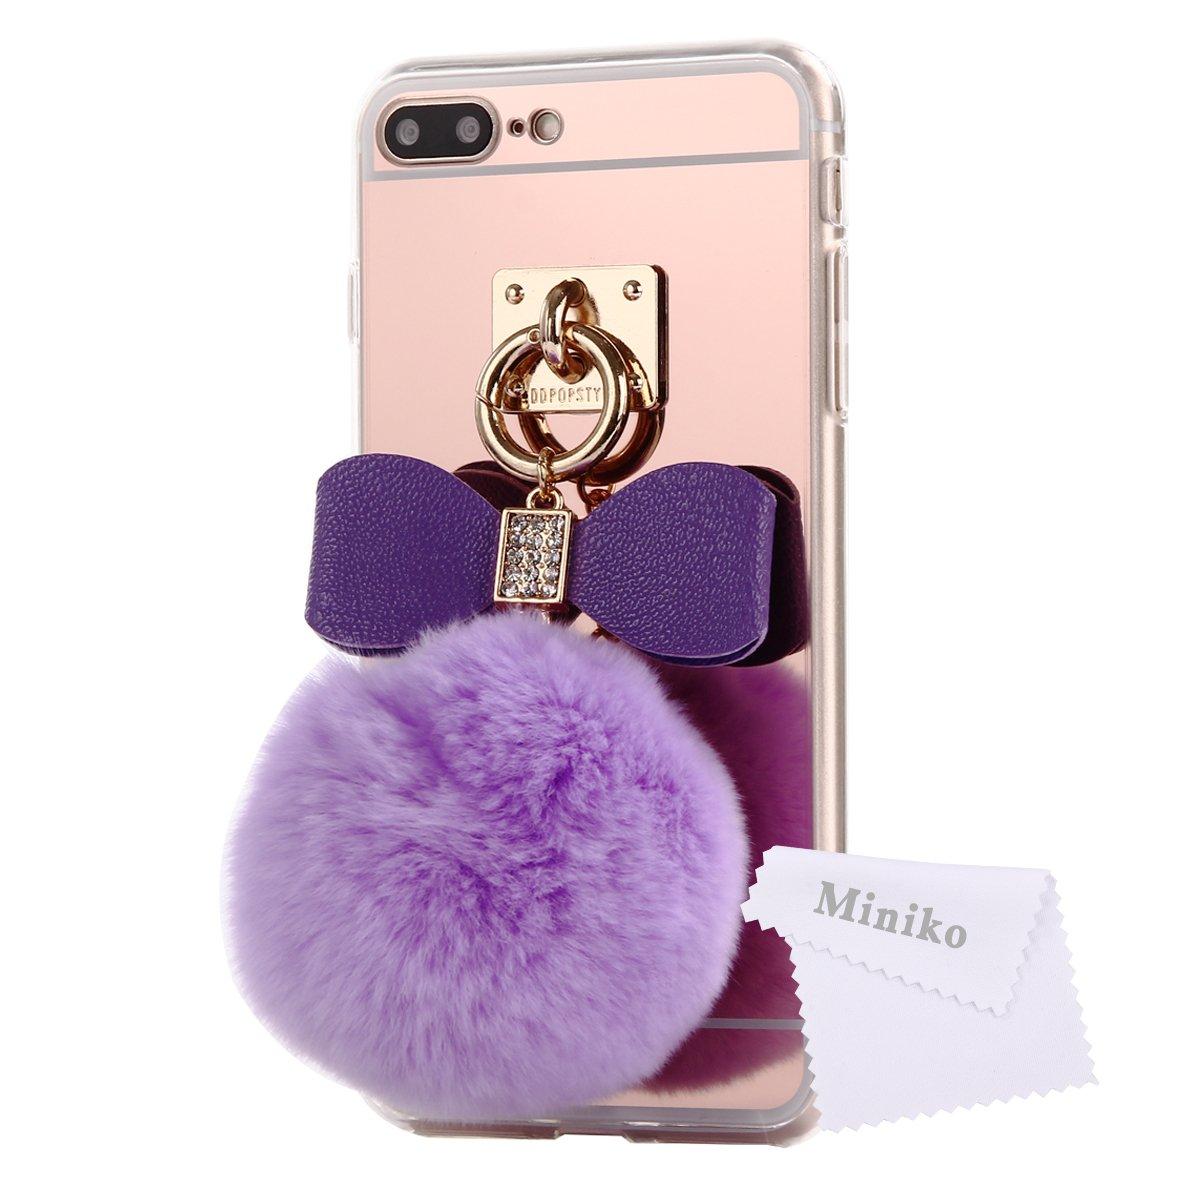 mirror girls teen Iphone